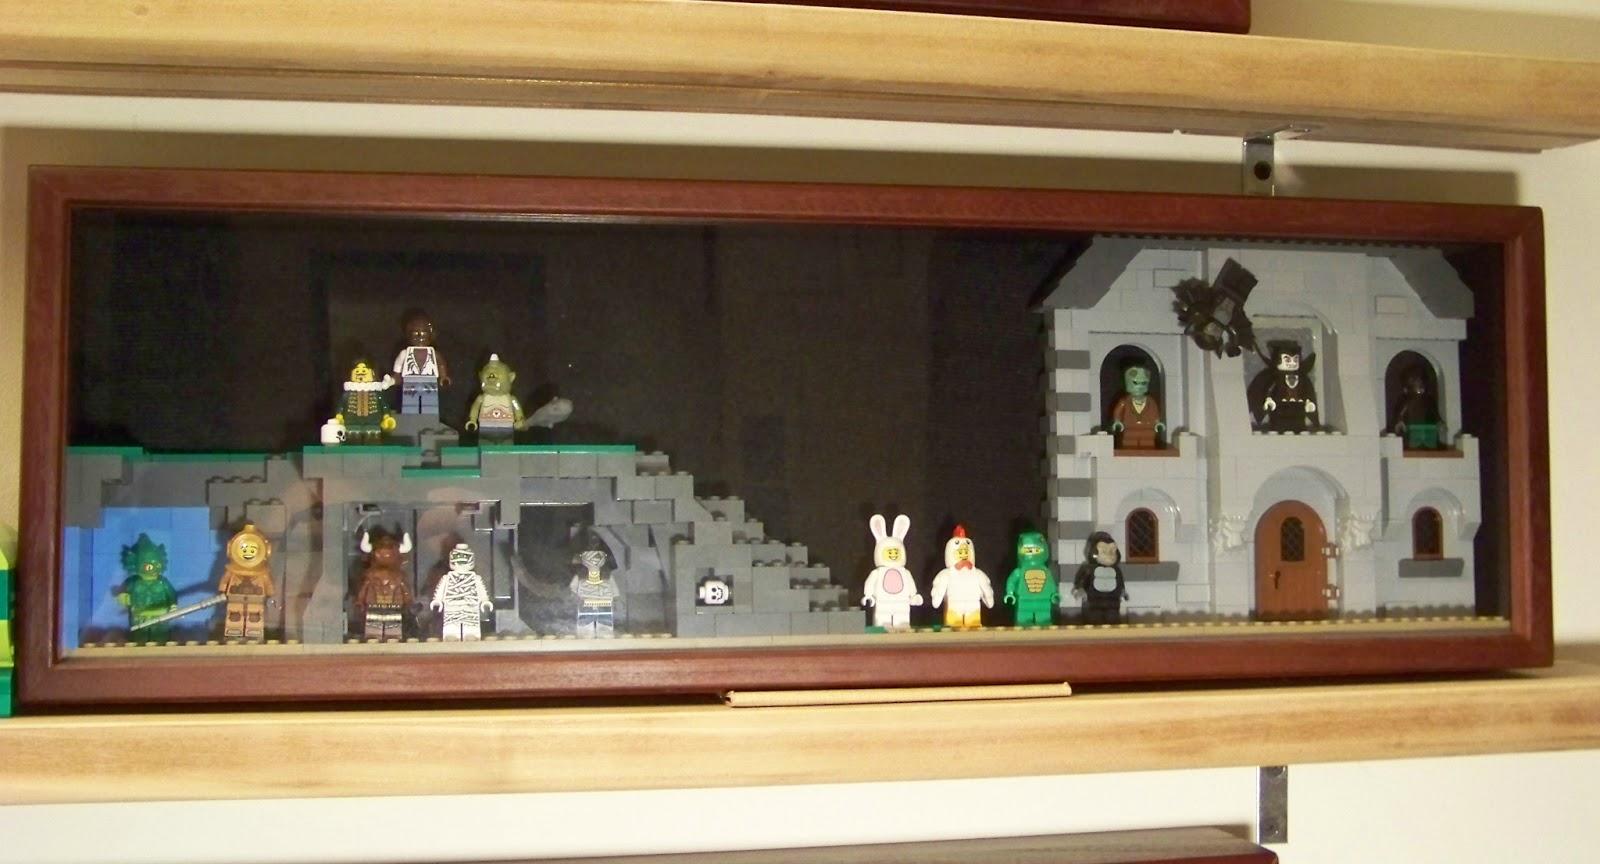 Cavort Lego Display Diorama Shadow Box